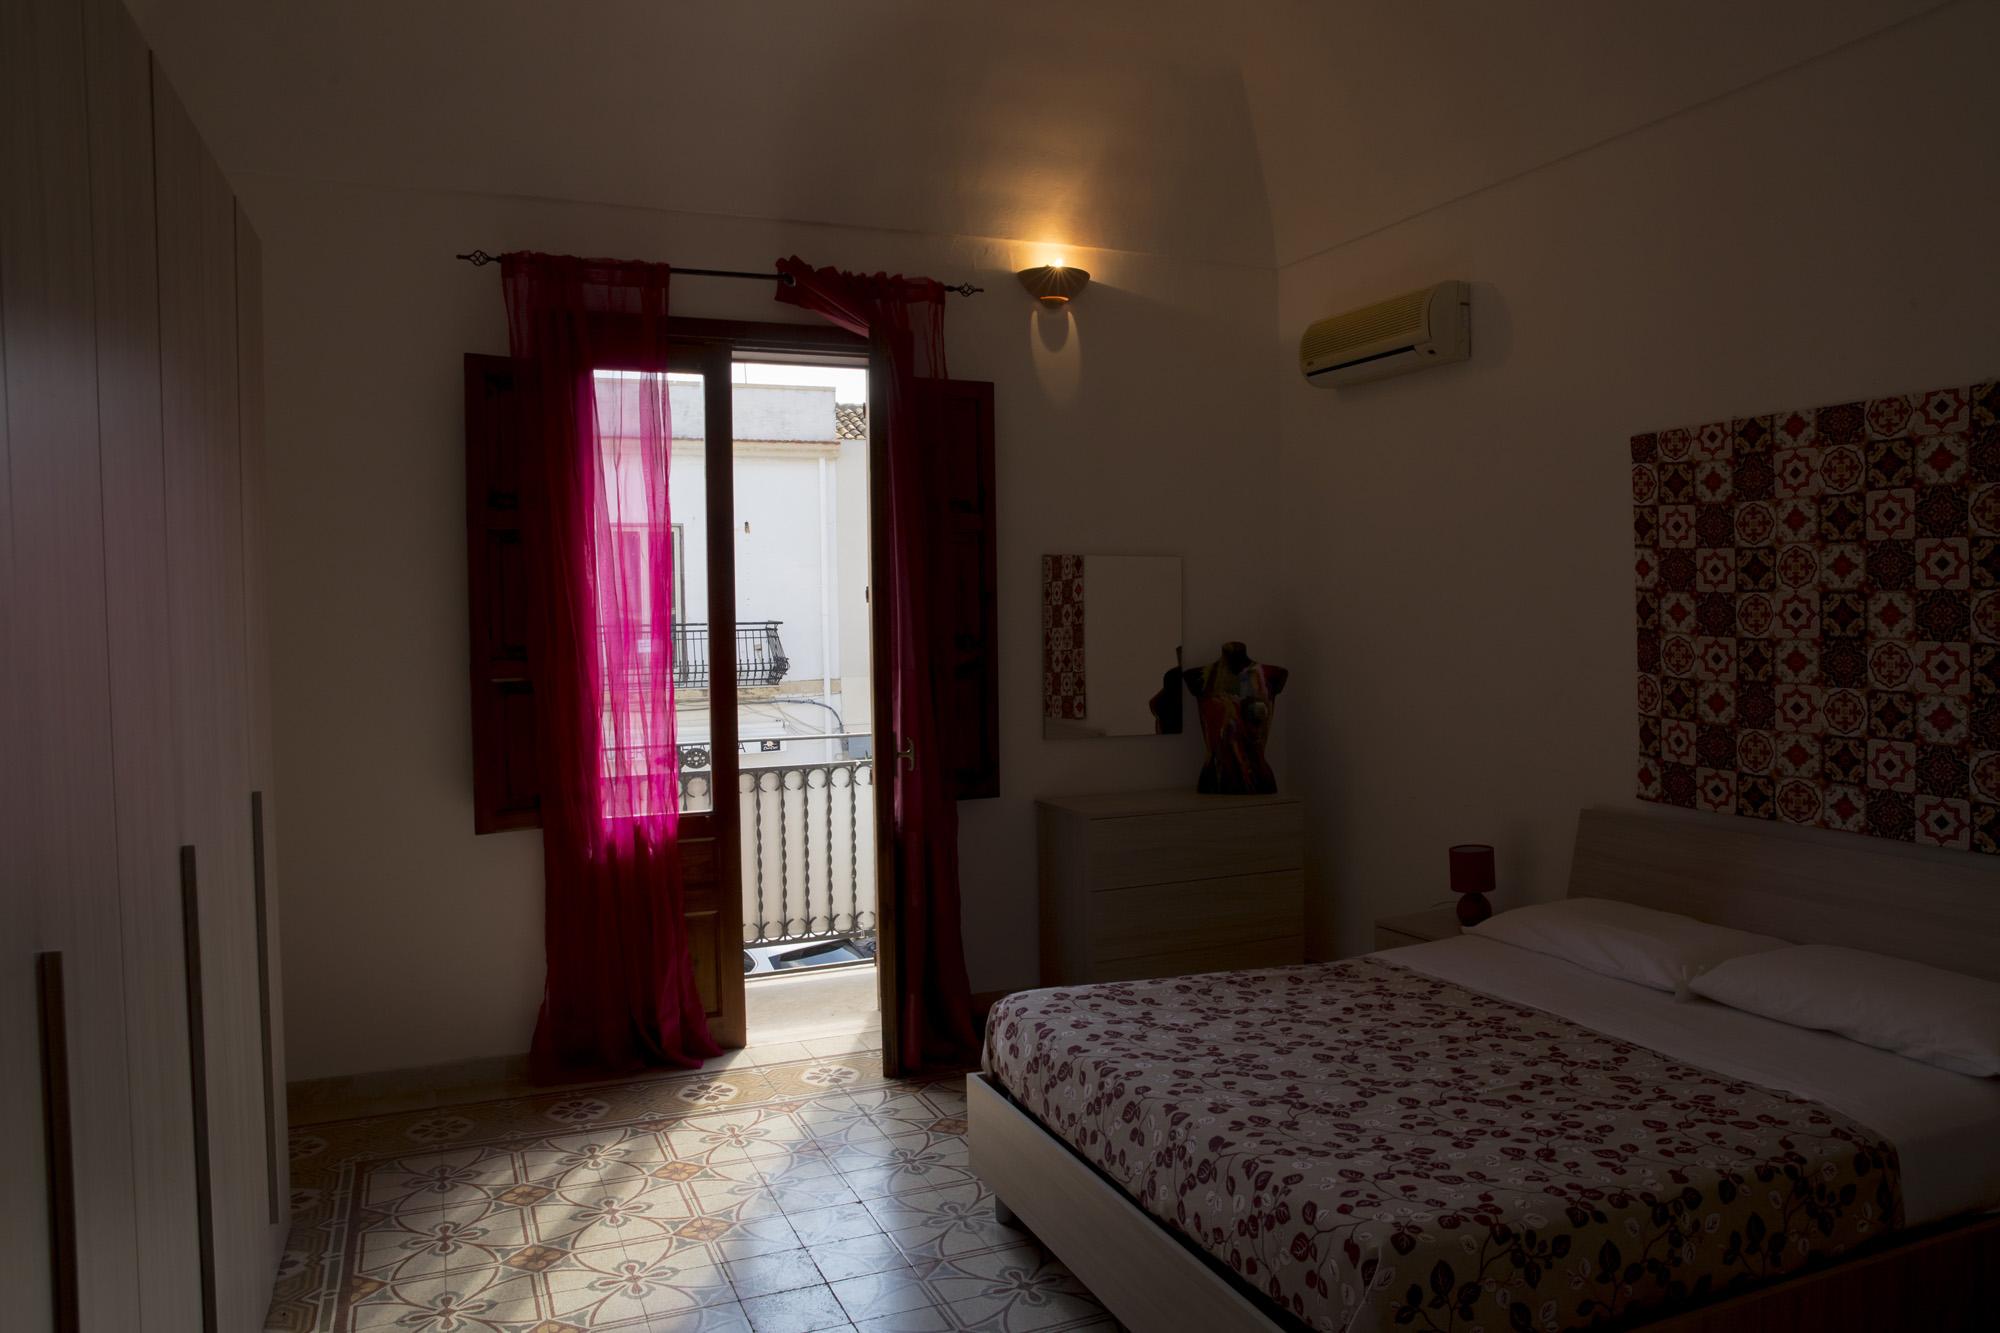 Around San Vito - Savoia 46